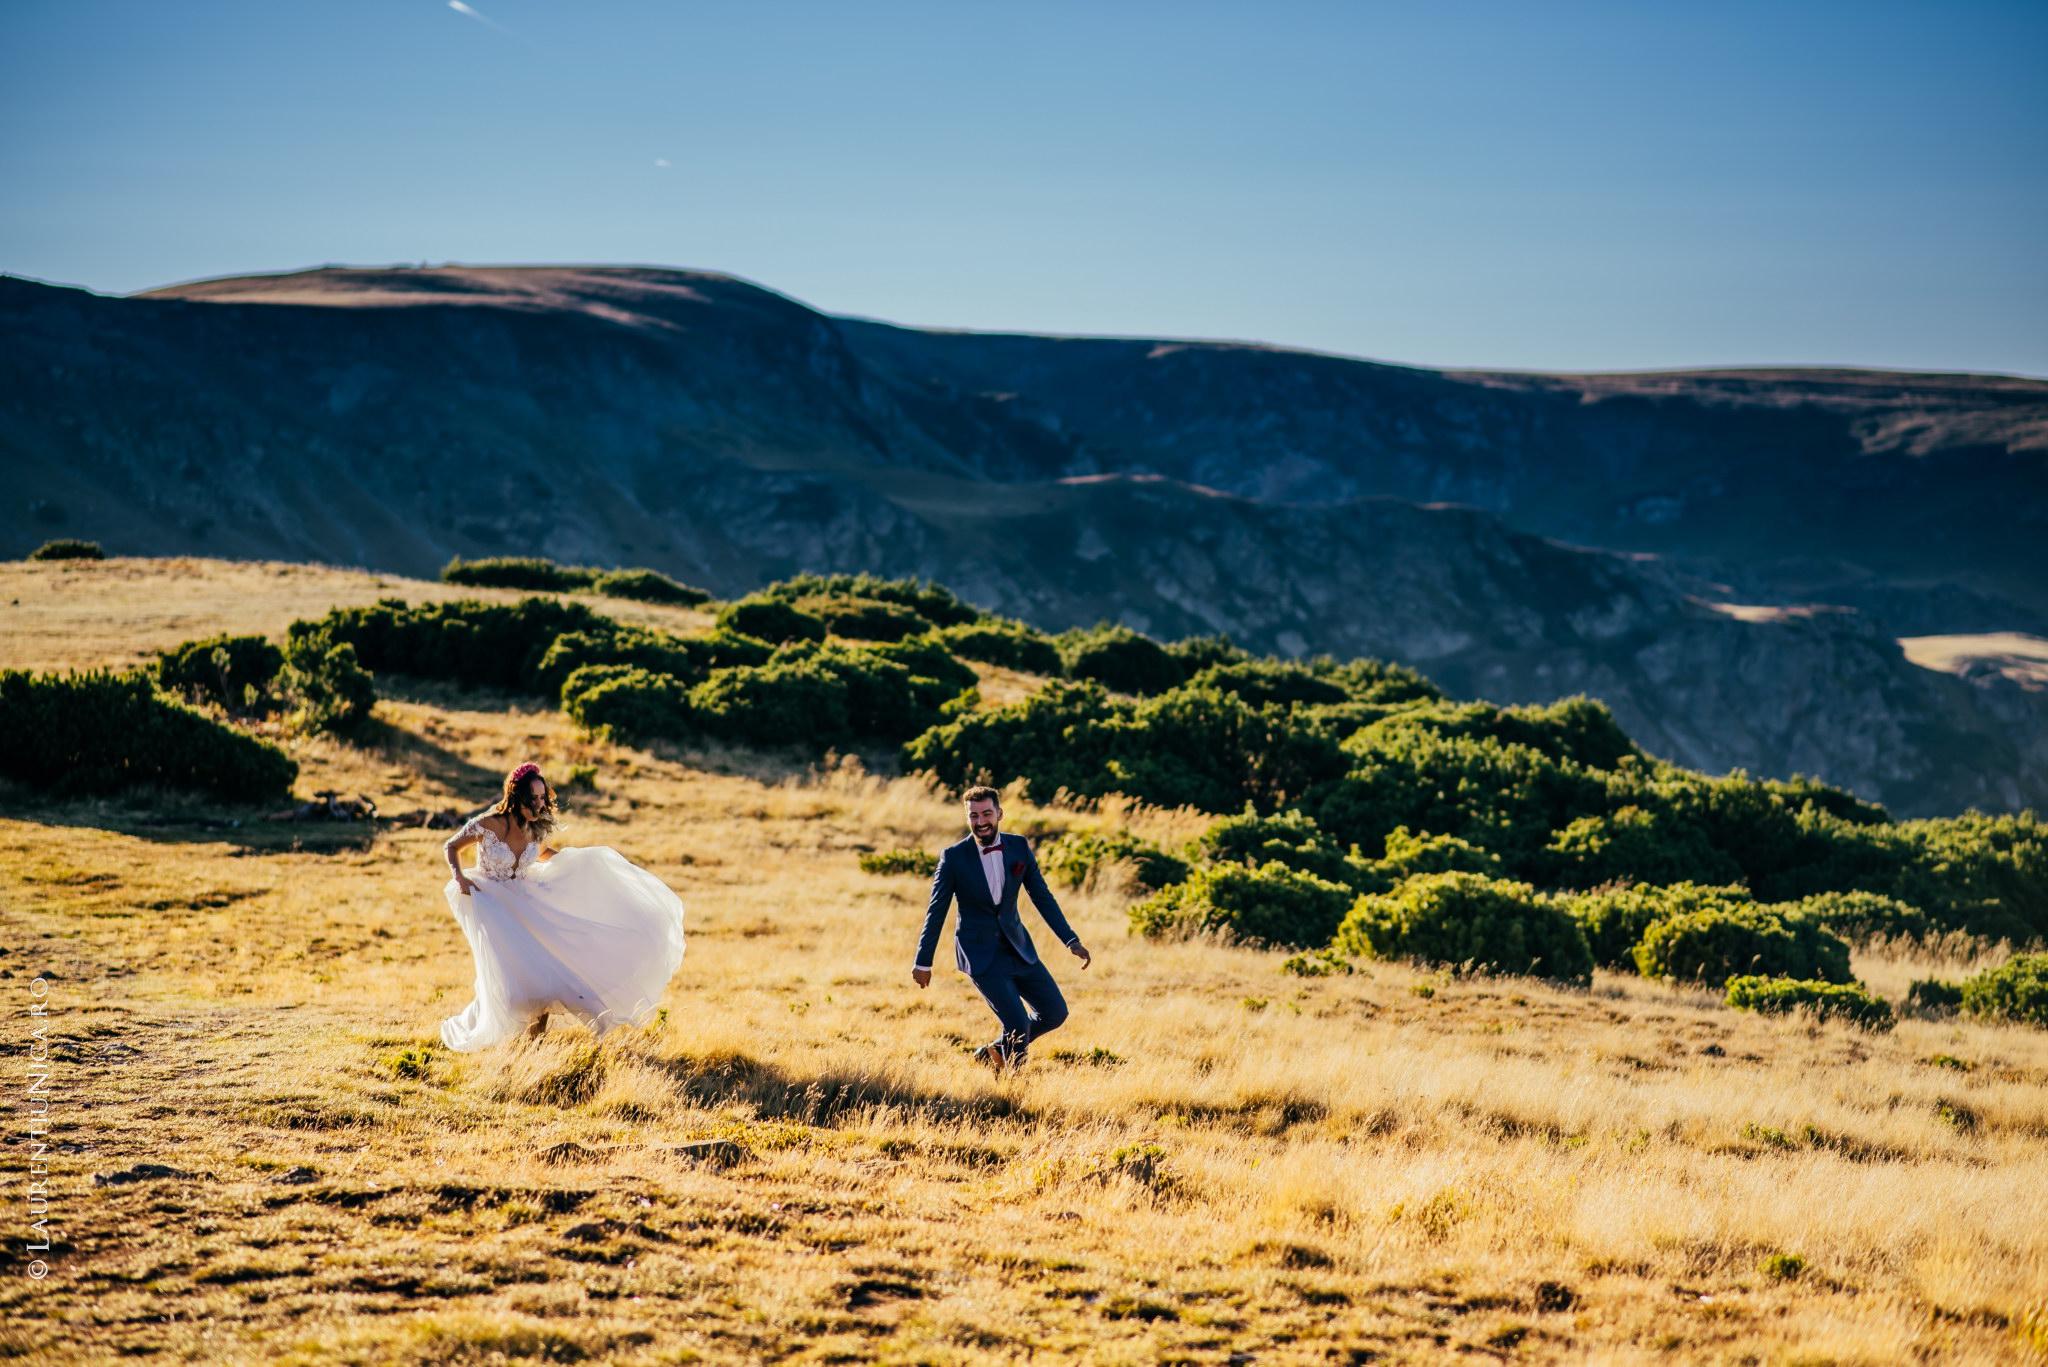 aida si alin fotograf nunta laurentiu nica transalpina 18 - Aida & Alin | Fotografii After Wedding | Transalpina - Muntii Parang